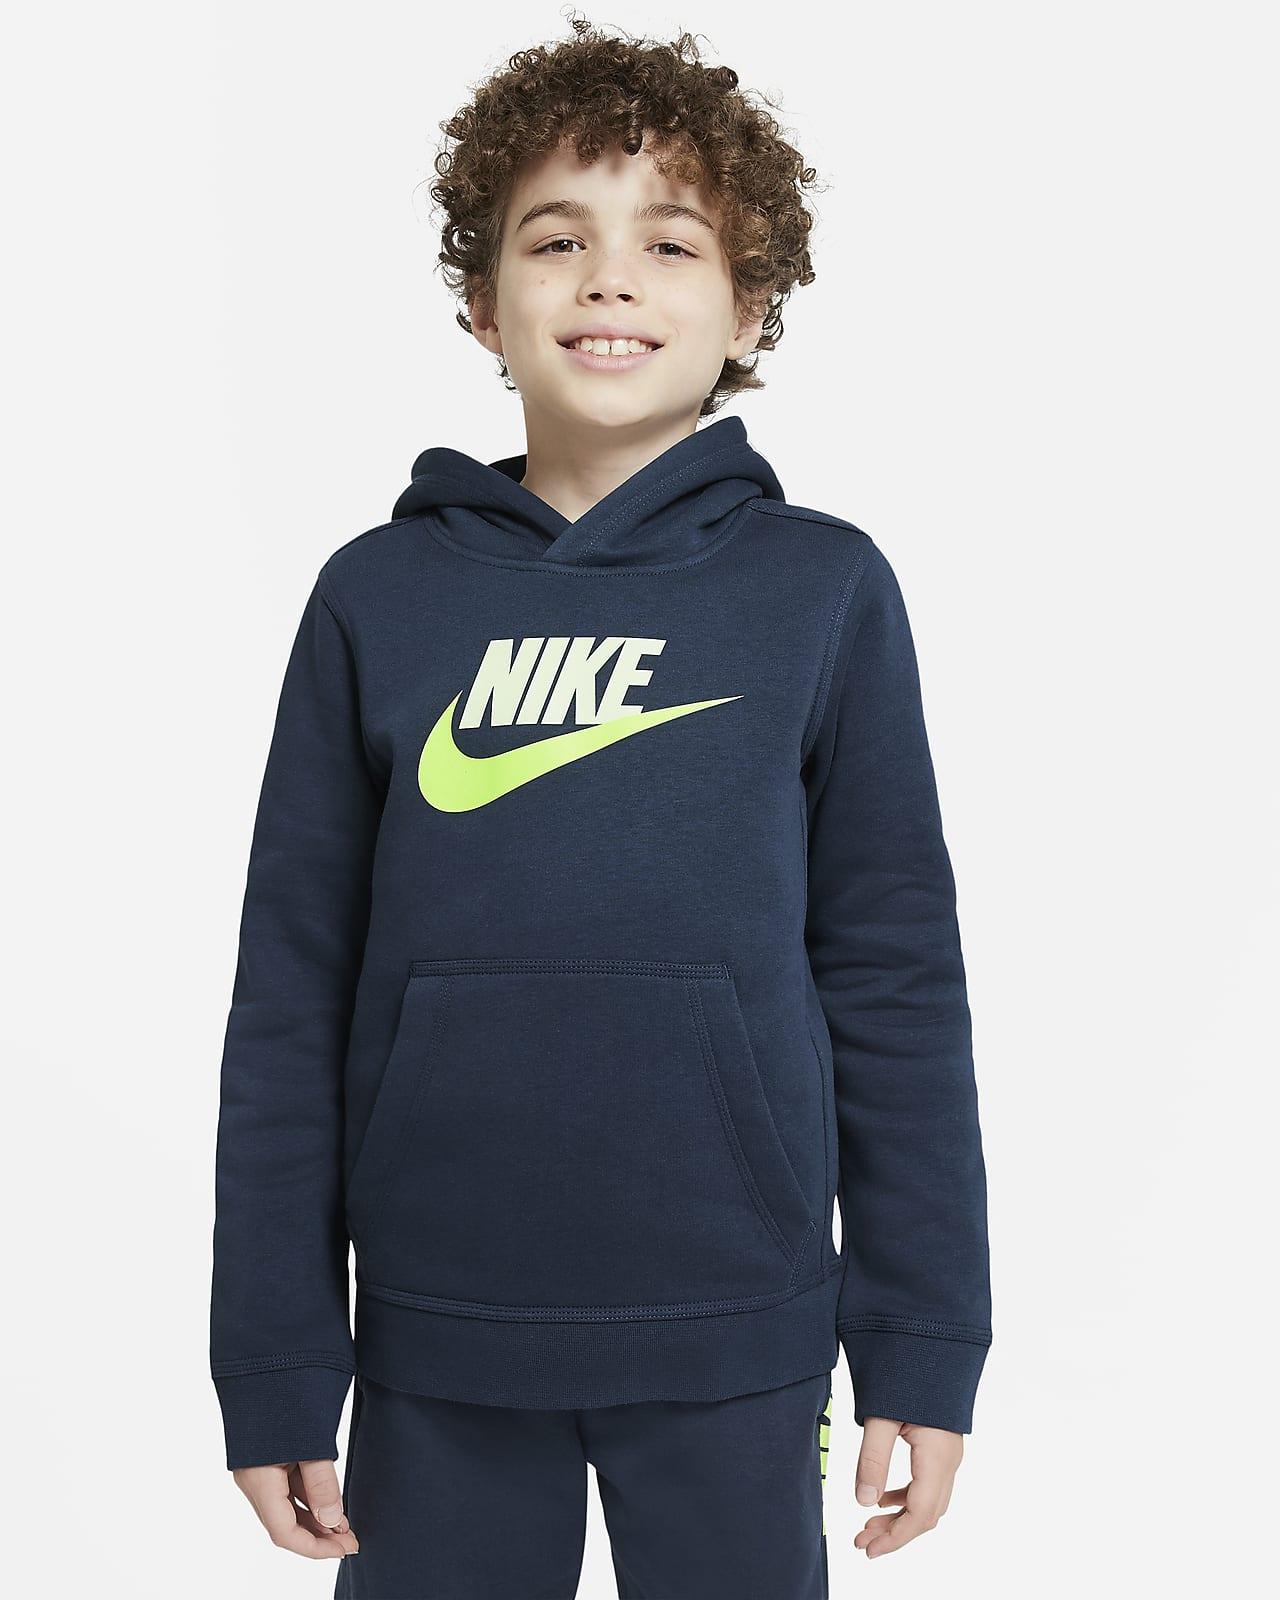 Nike Sportswear Club Fleece Older Kids' Pullover Hoodie